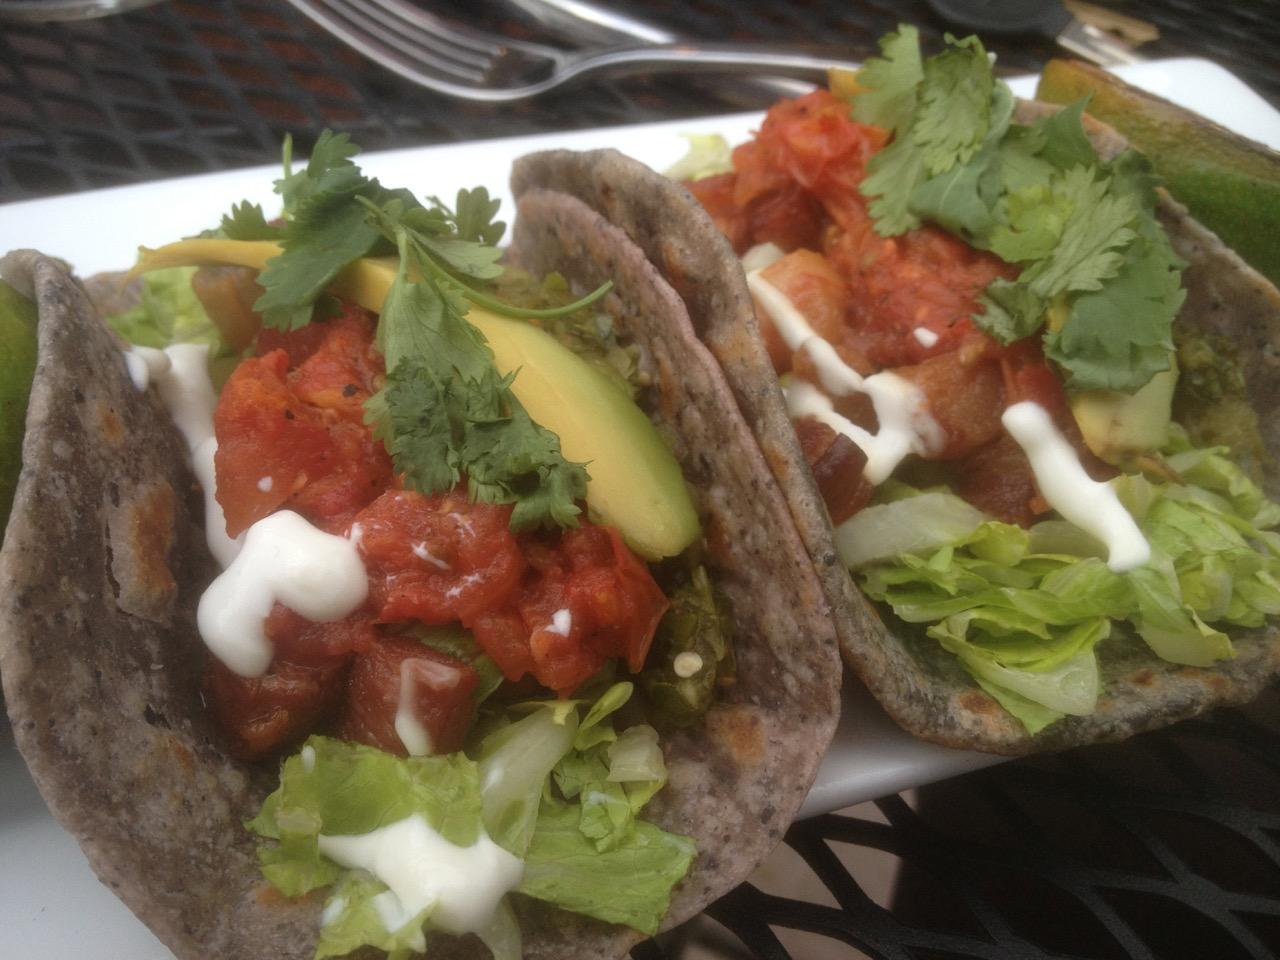 Tacos at Bookwalter - June 19 2013